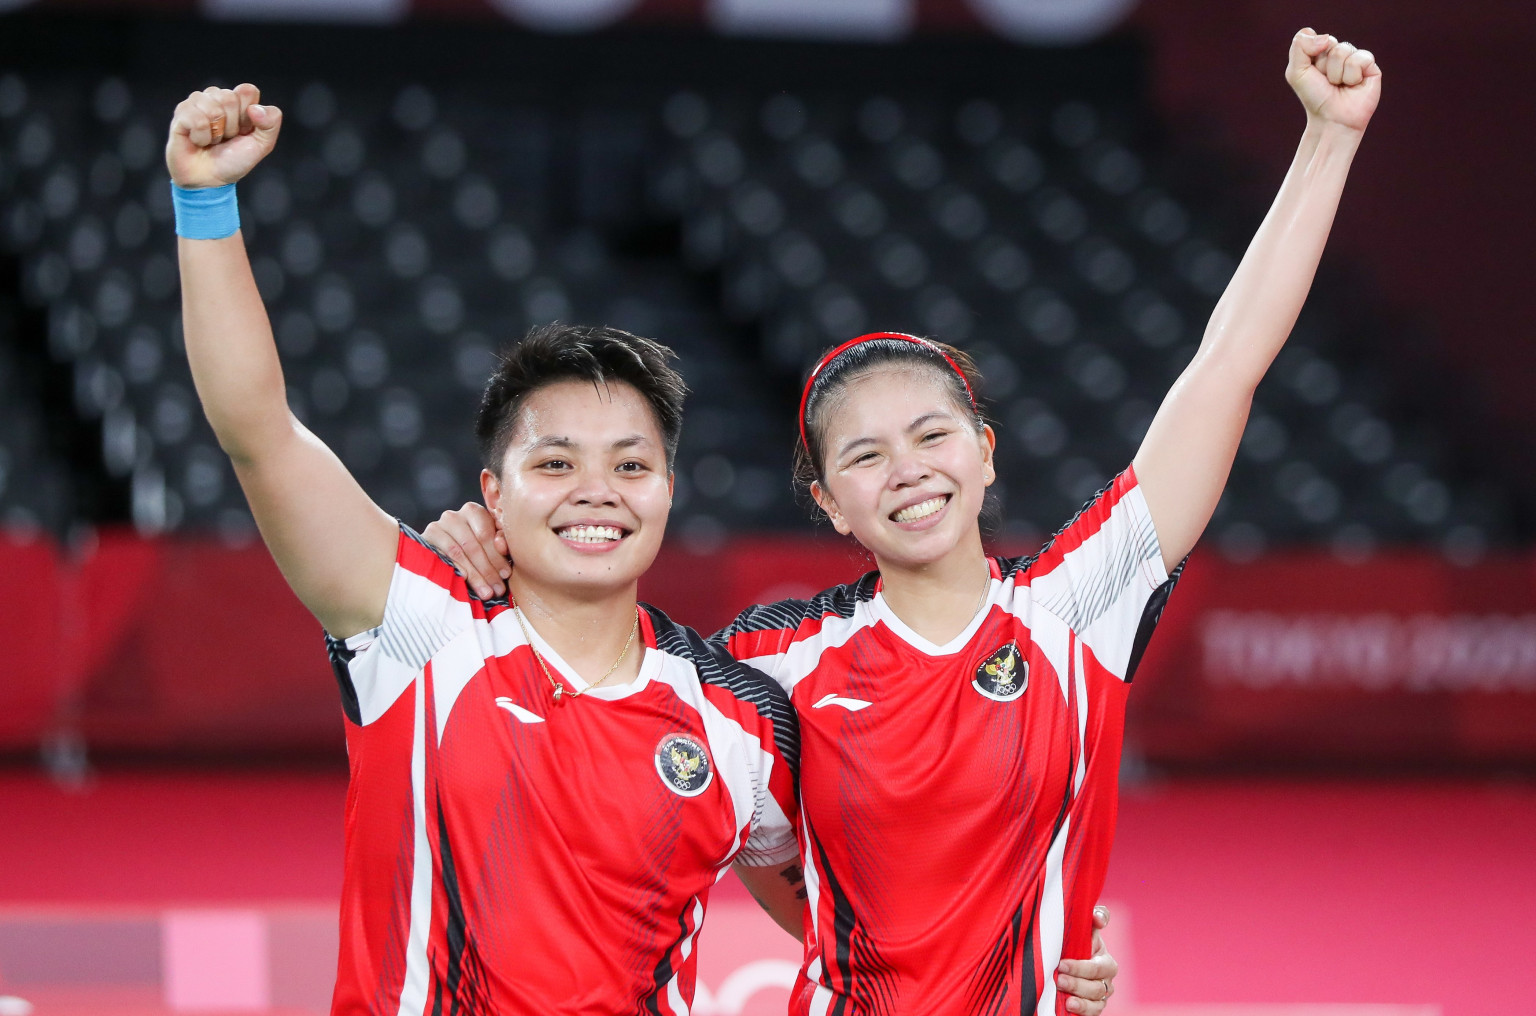 Greysia Polii e Apriyan Rahayu badminton Olimpíadas